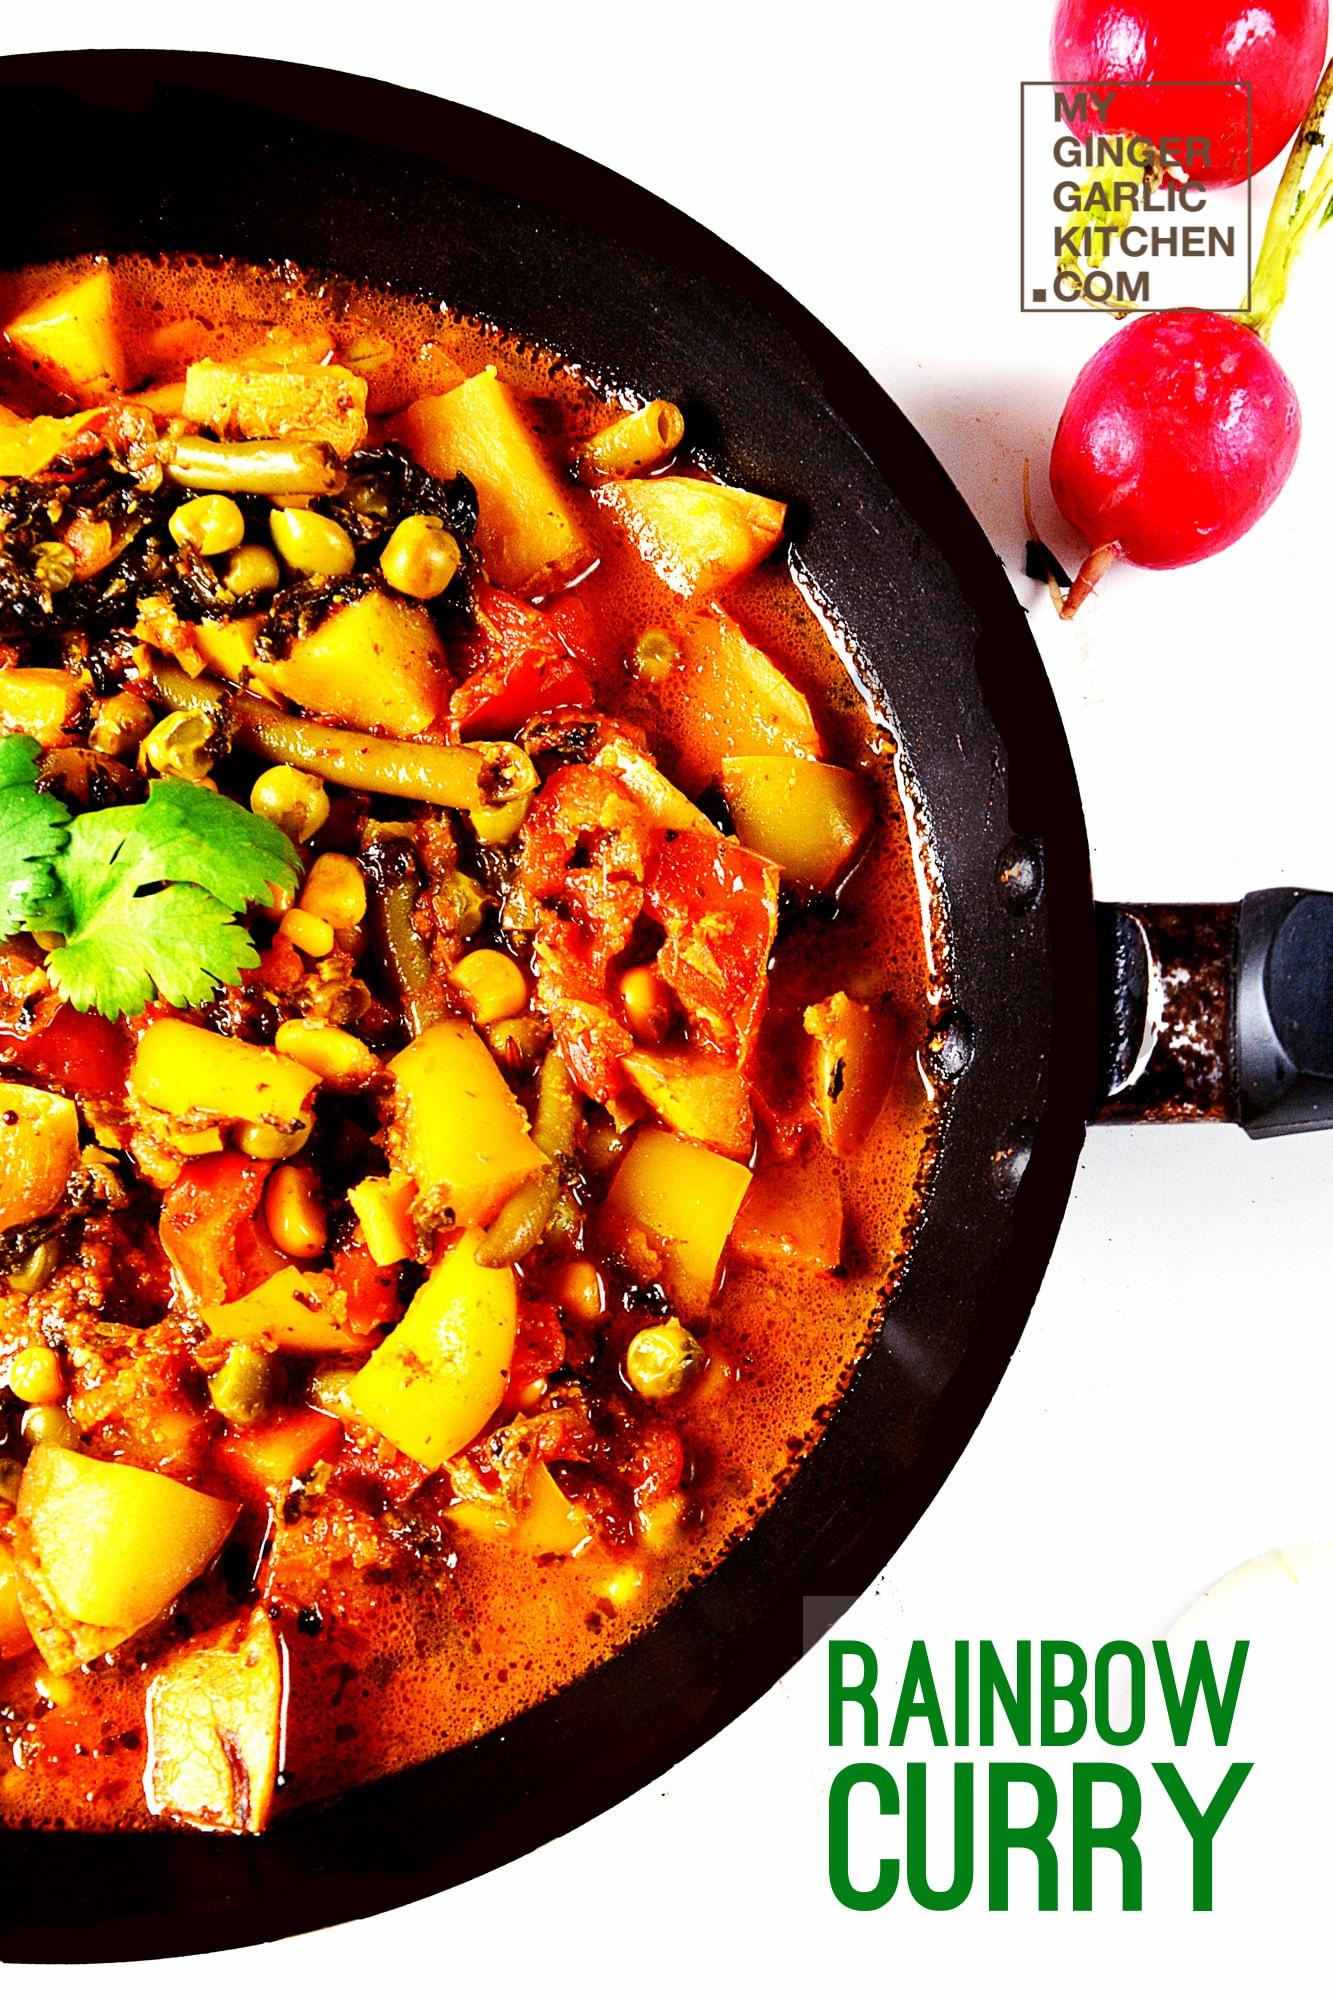 Image - recipe pressure cooker rainbow curry anupama paliwal my ginger garlic kitchen 2